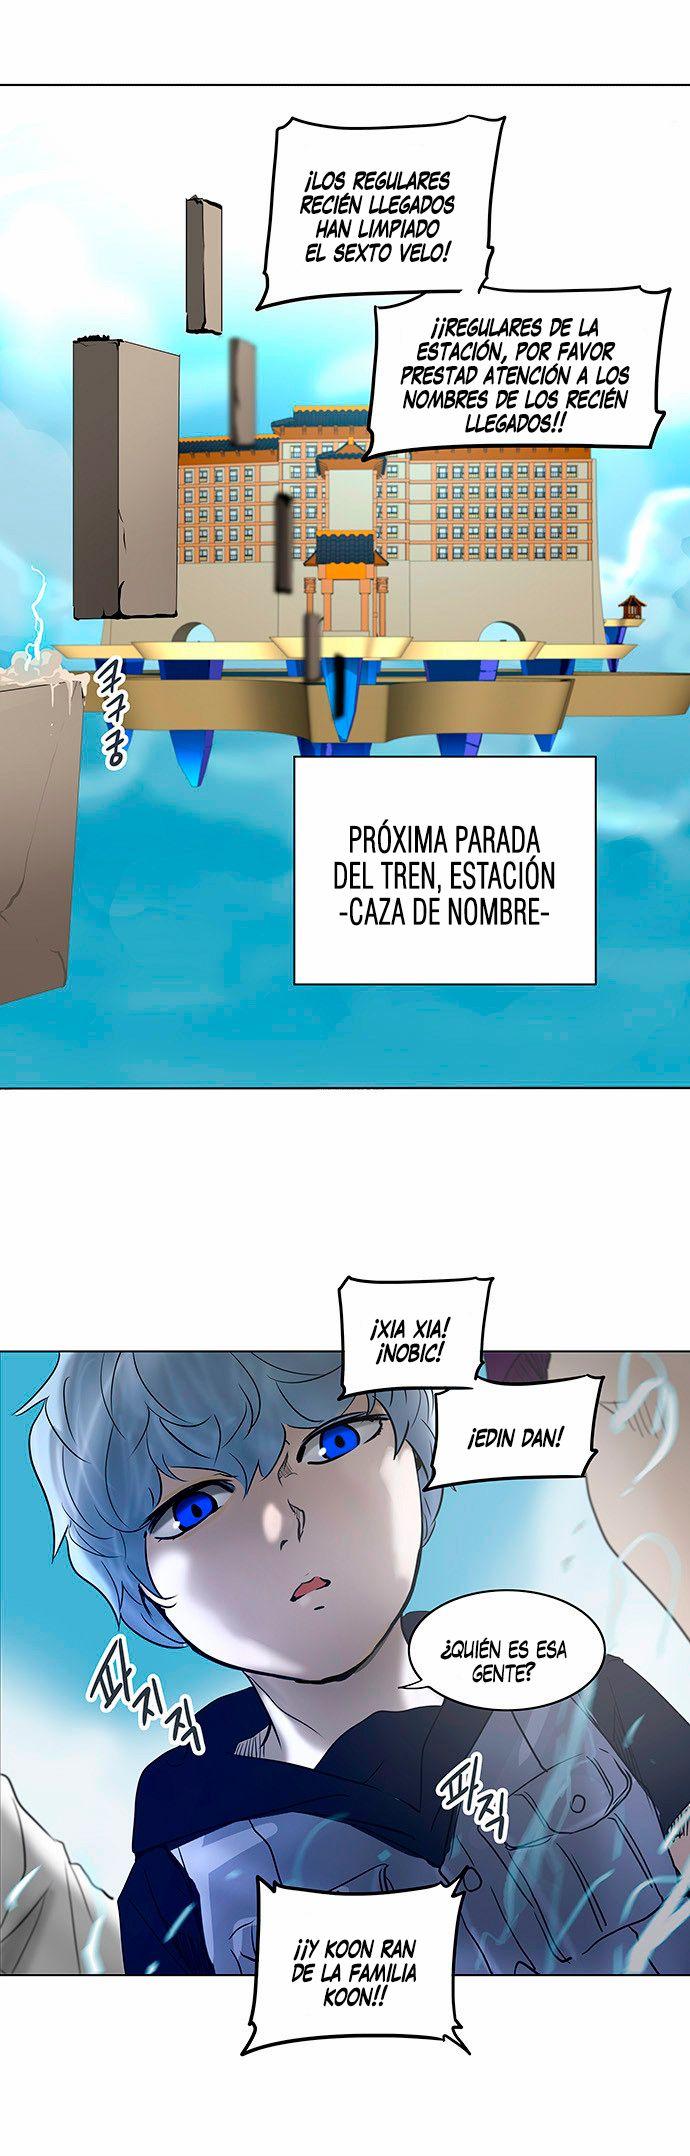 http://c5.ninemanga.com/es_manga/21/149/464053/72a8ab4748d4707fda159db0088d85de.jpg Page 3